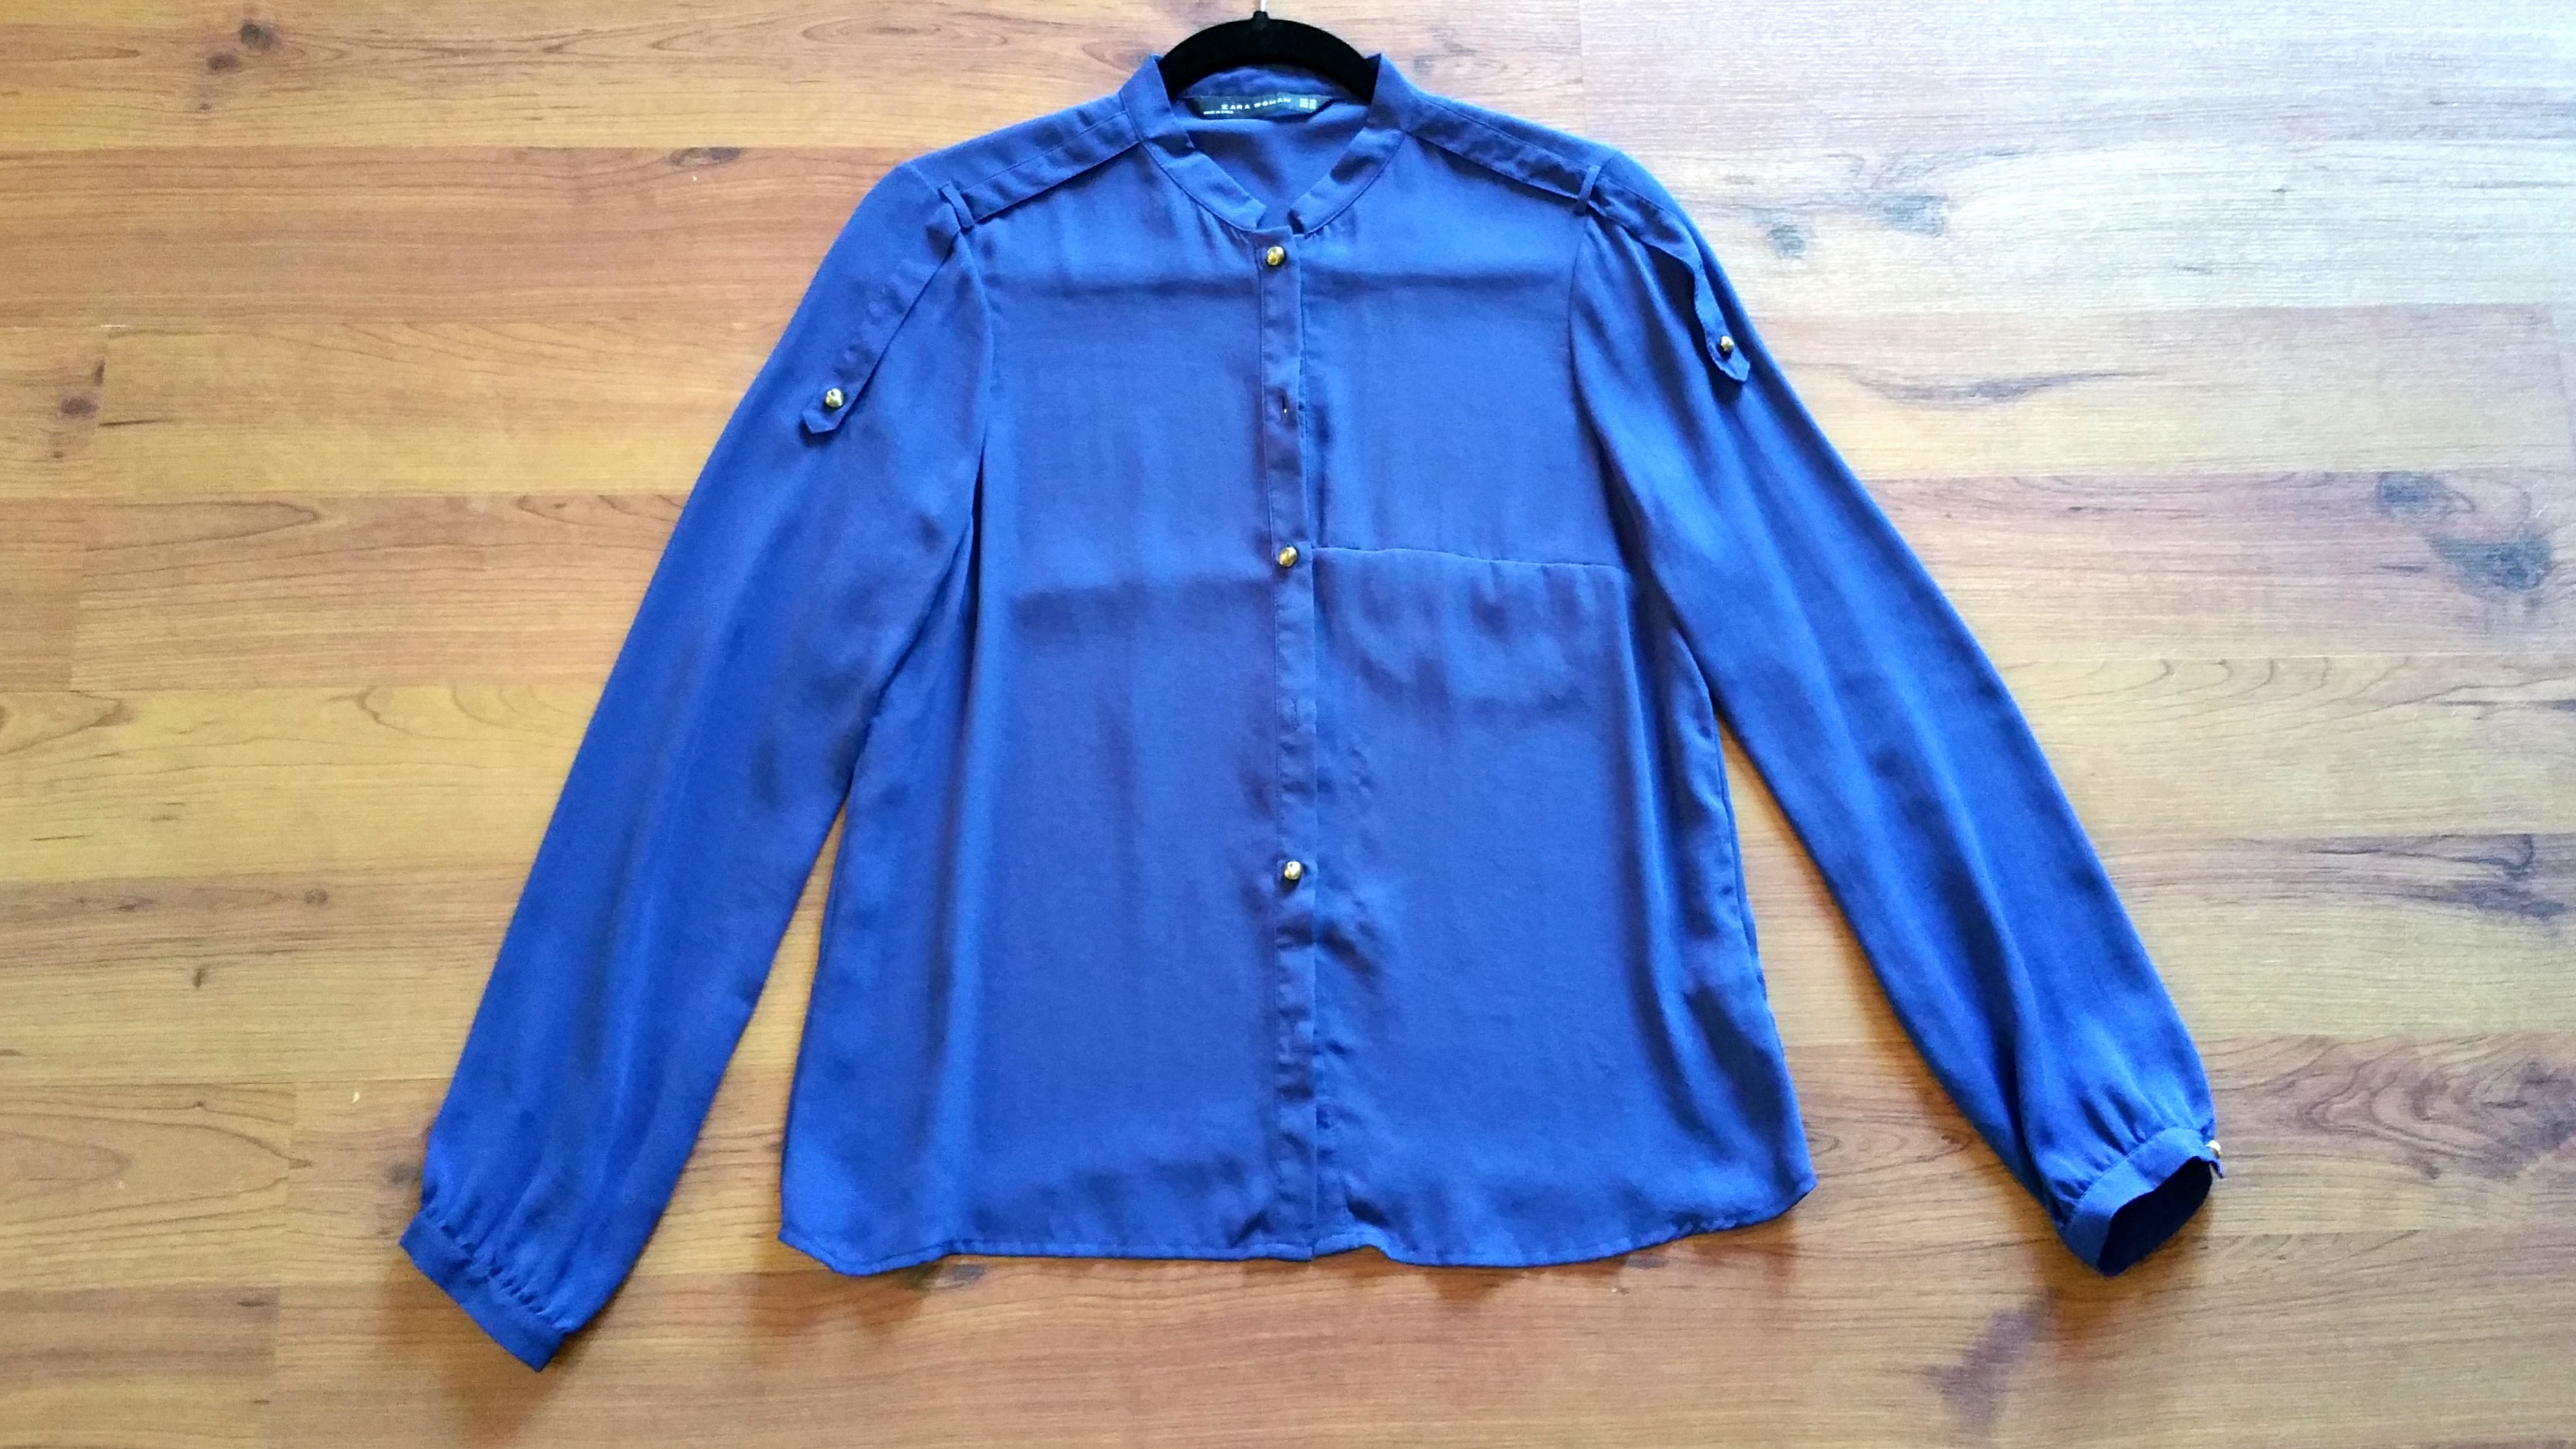 64b5c1cea72d83 Zara woman cos bonito HM blue silk blouse shirt XS